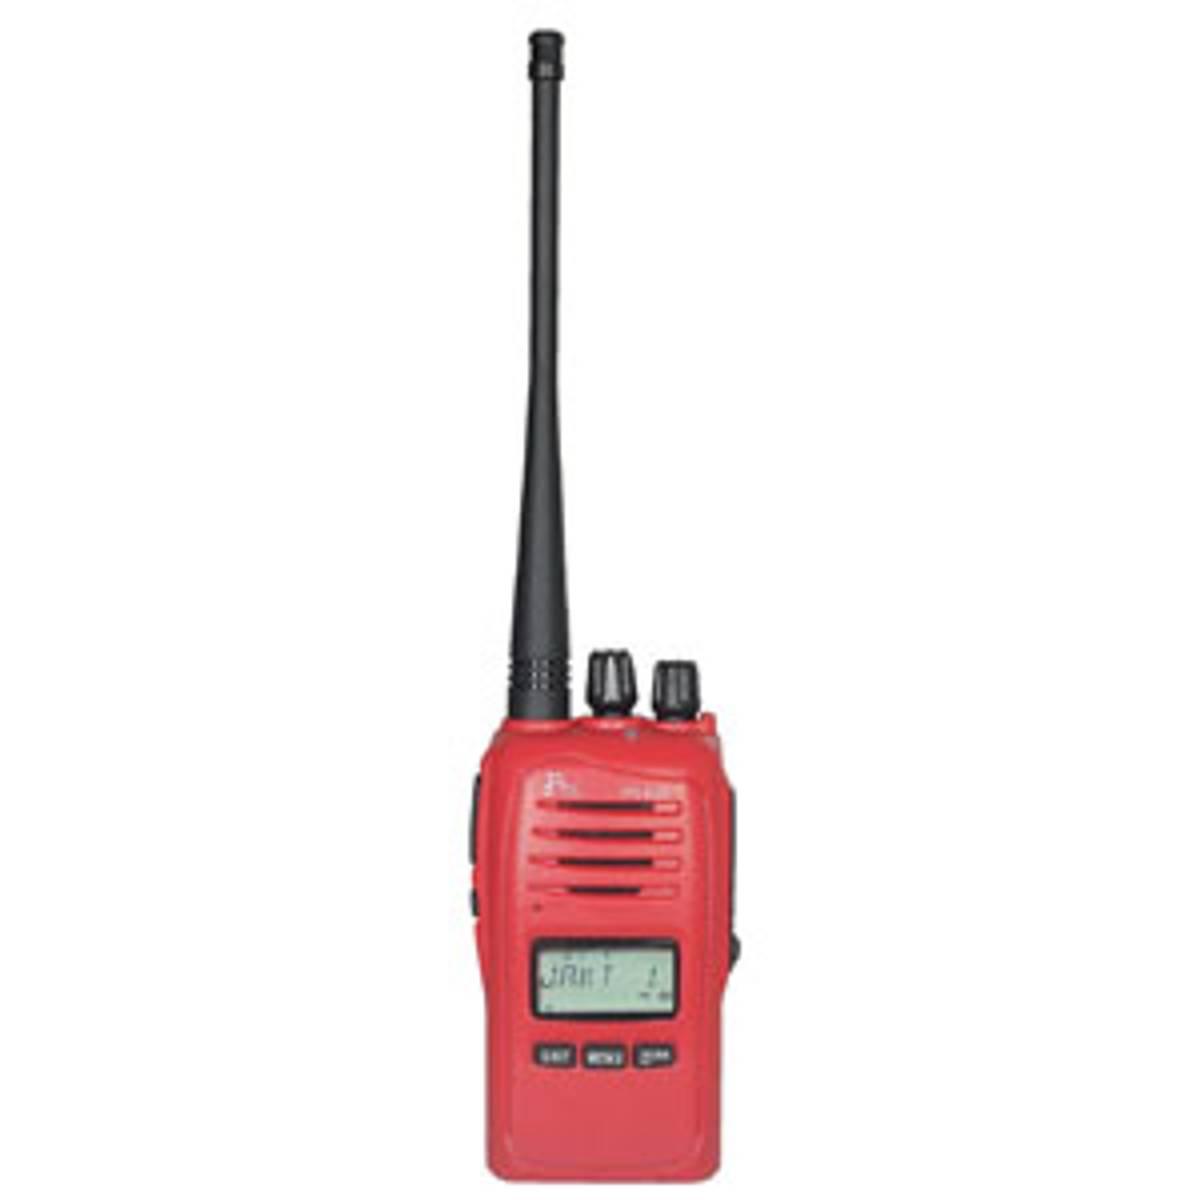 Brecom VR-600 VHF jaktradio